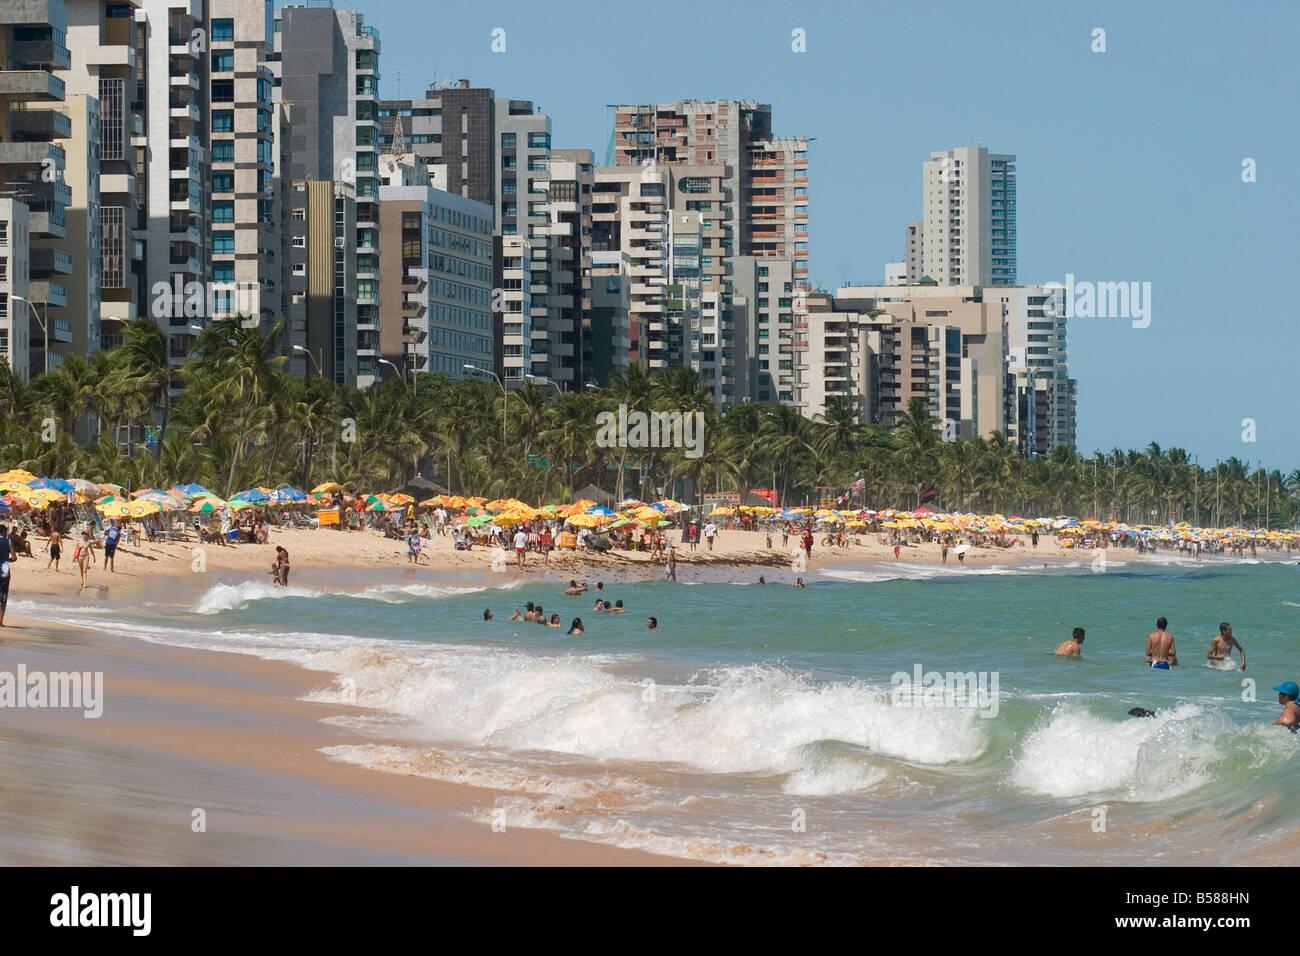 Boa Viagem beach Recife Pernambuco Brazil South America - Stock Image